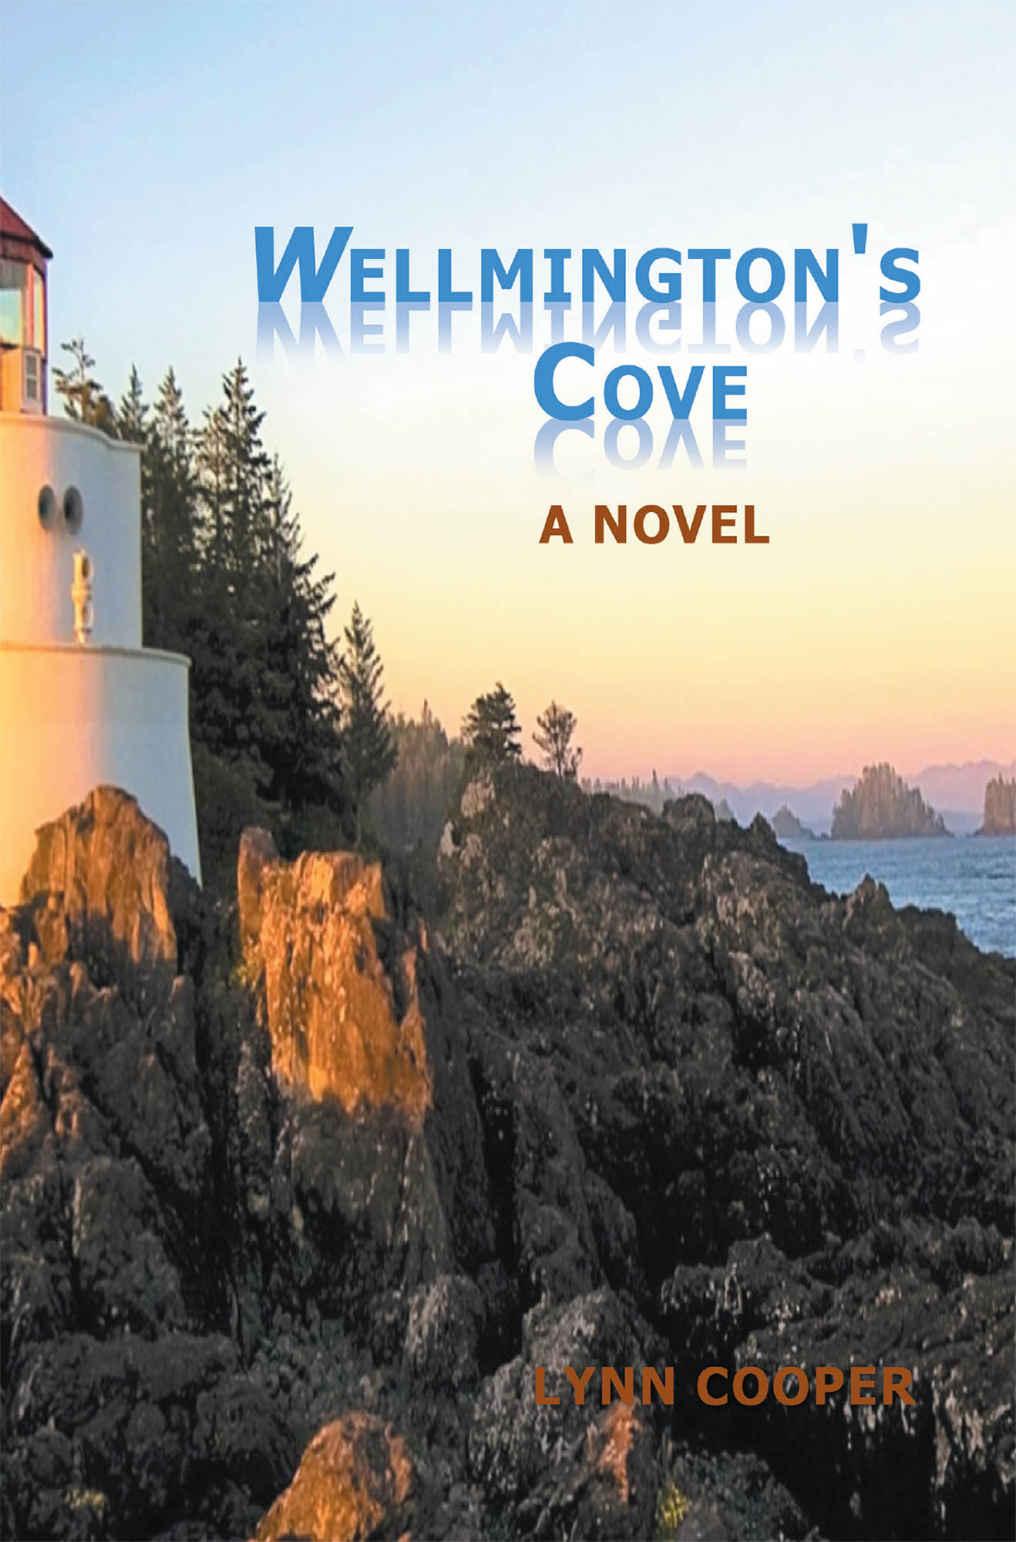 WELLMINGTON'S COVE